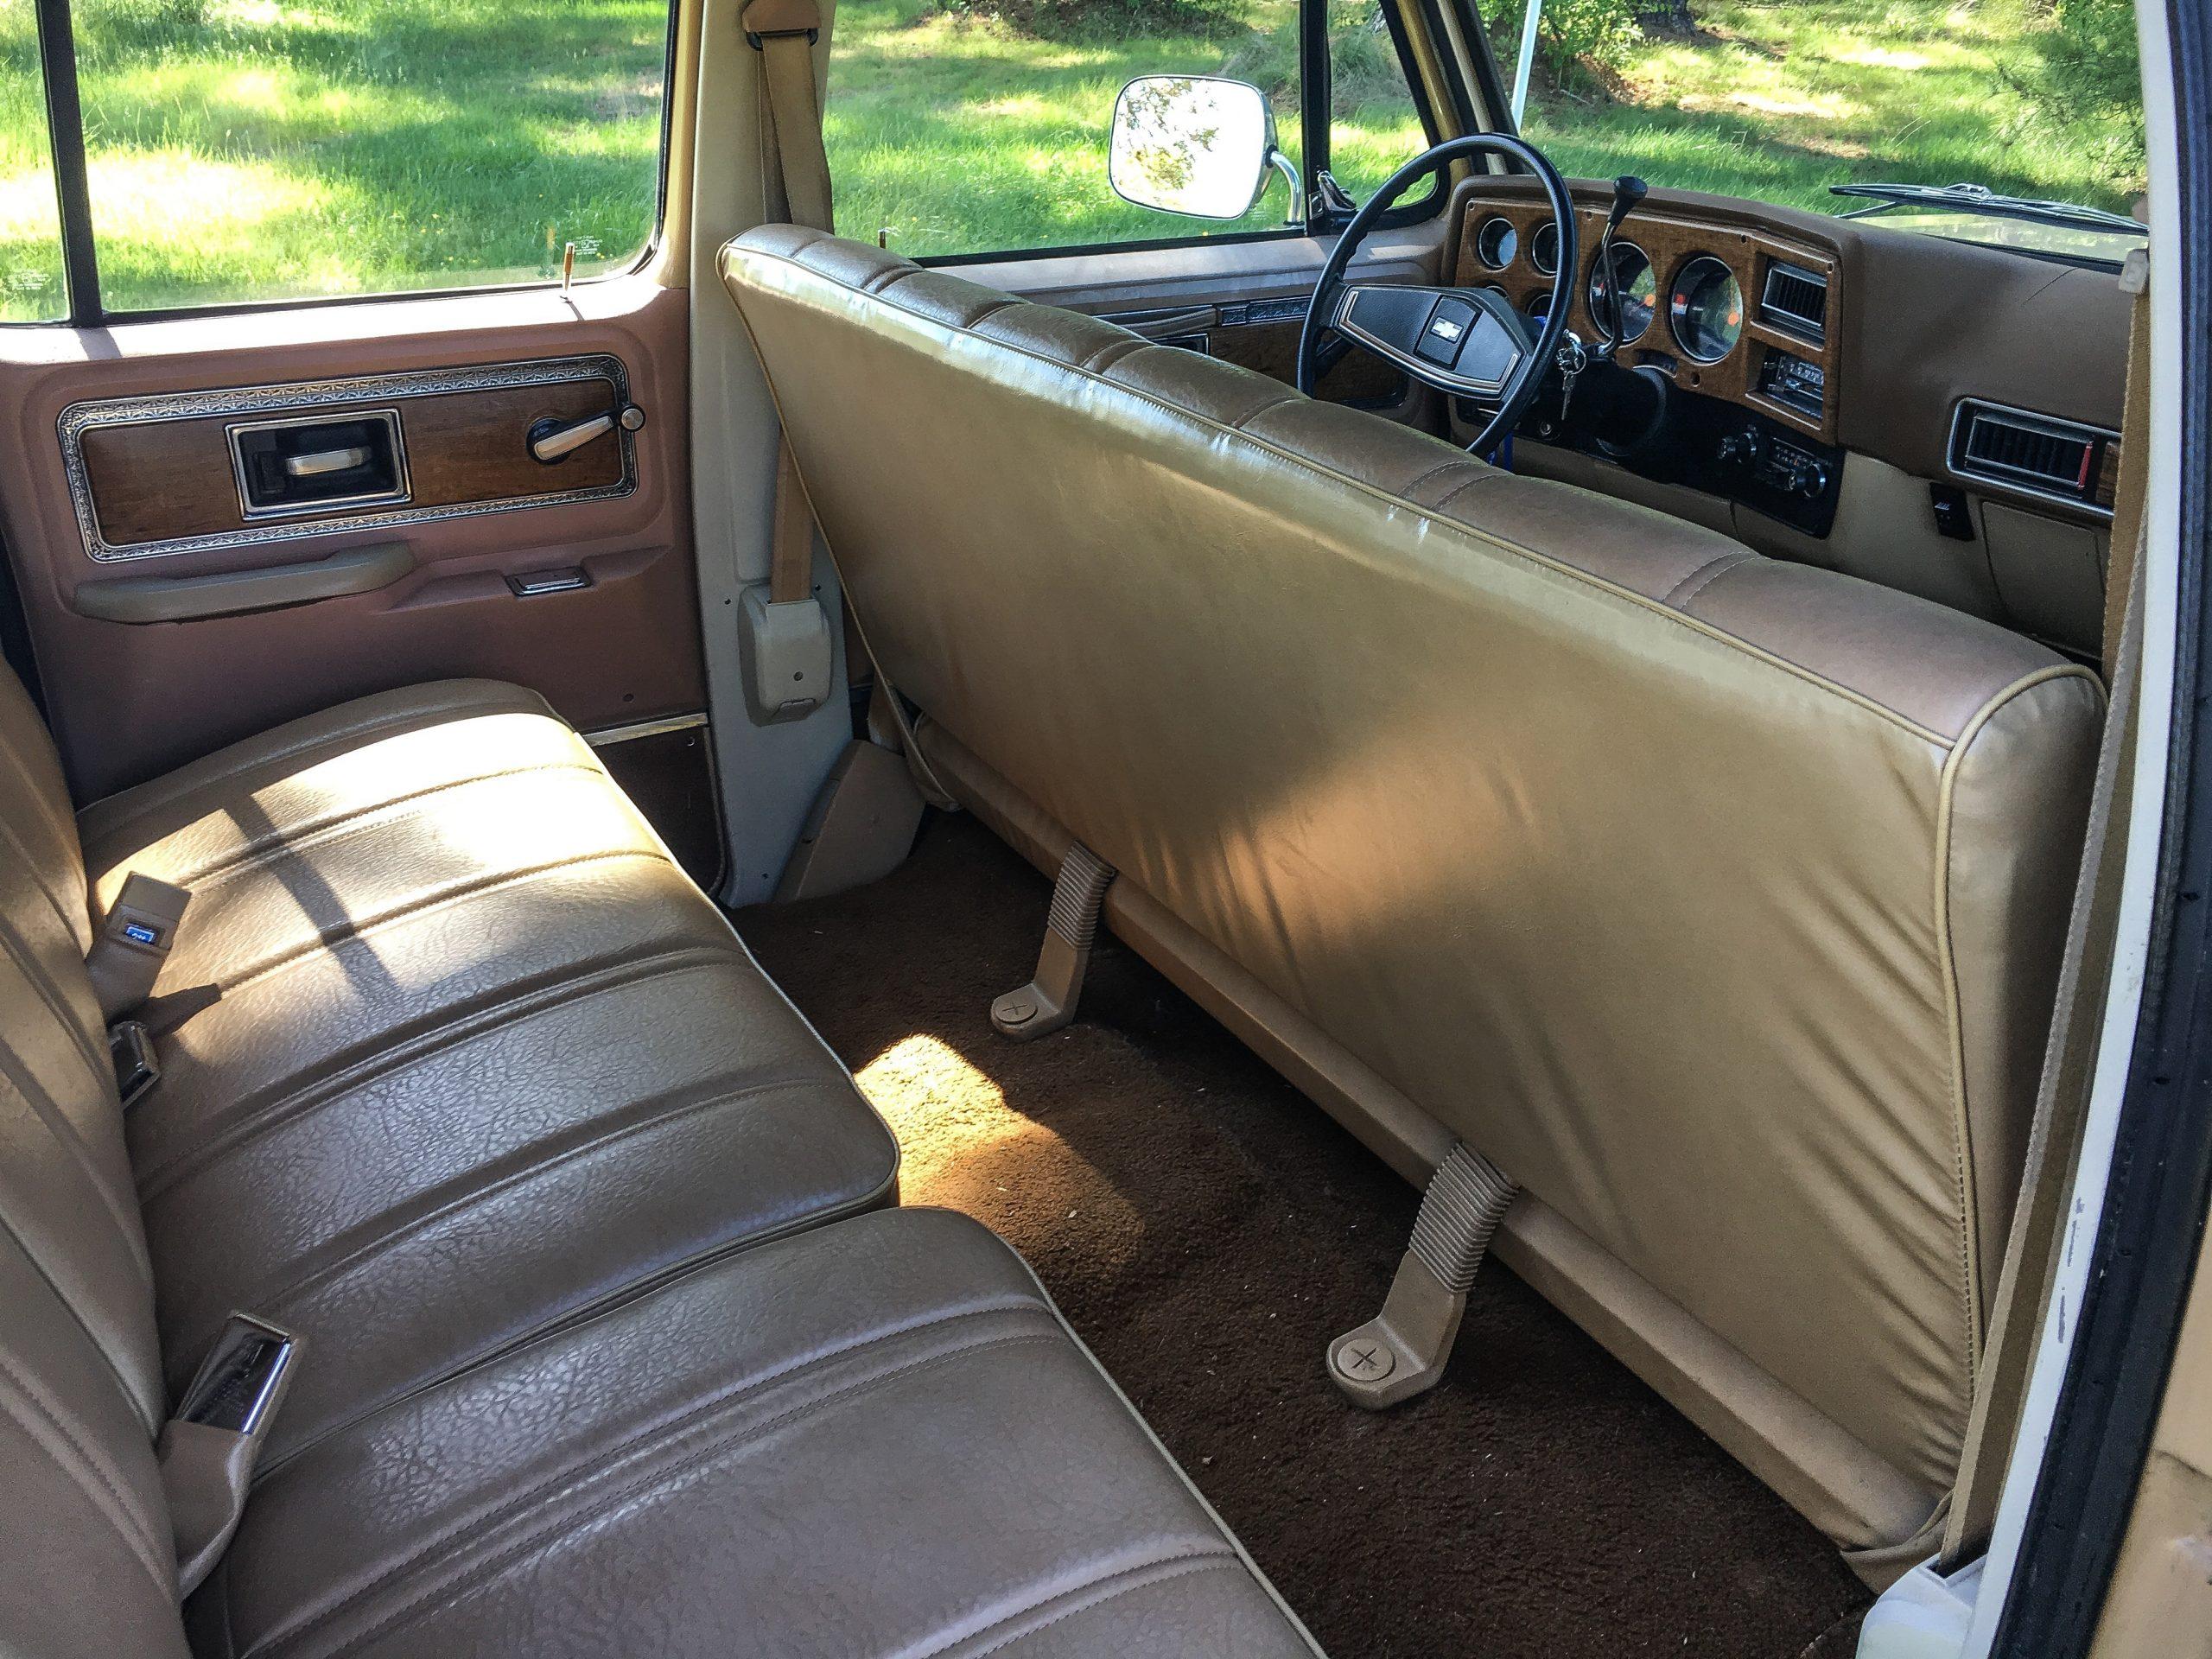 1977 Chevrolet Suburban interior rear seats